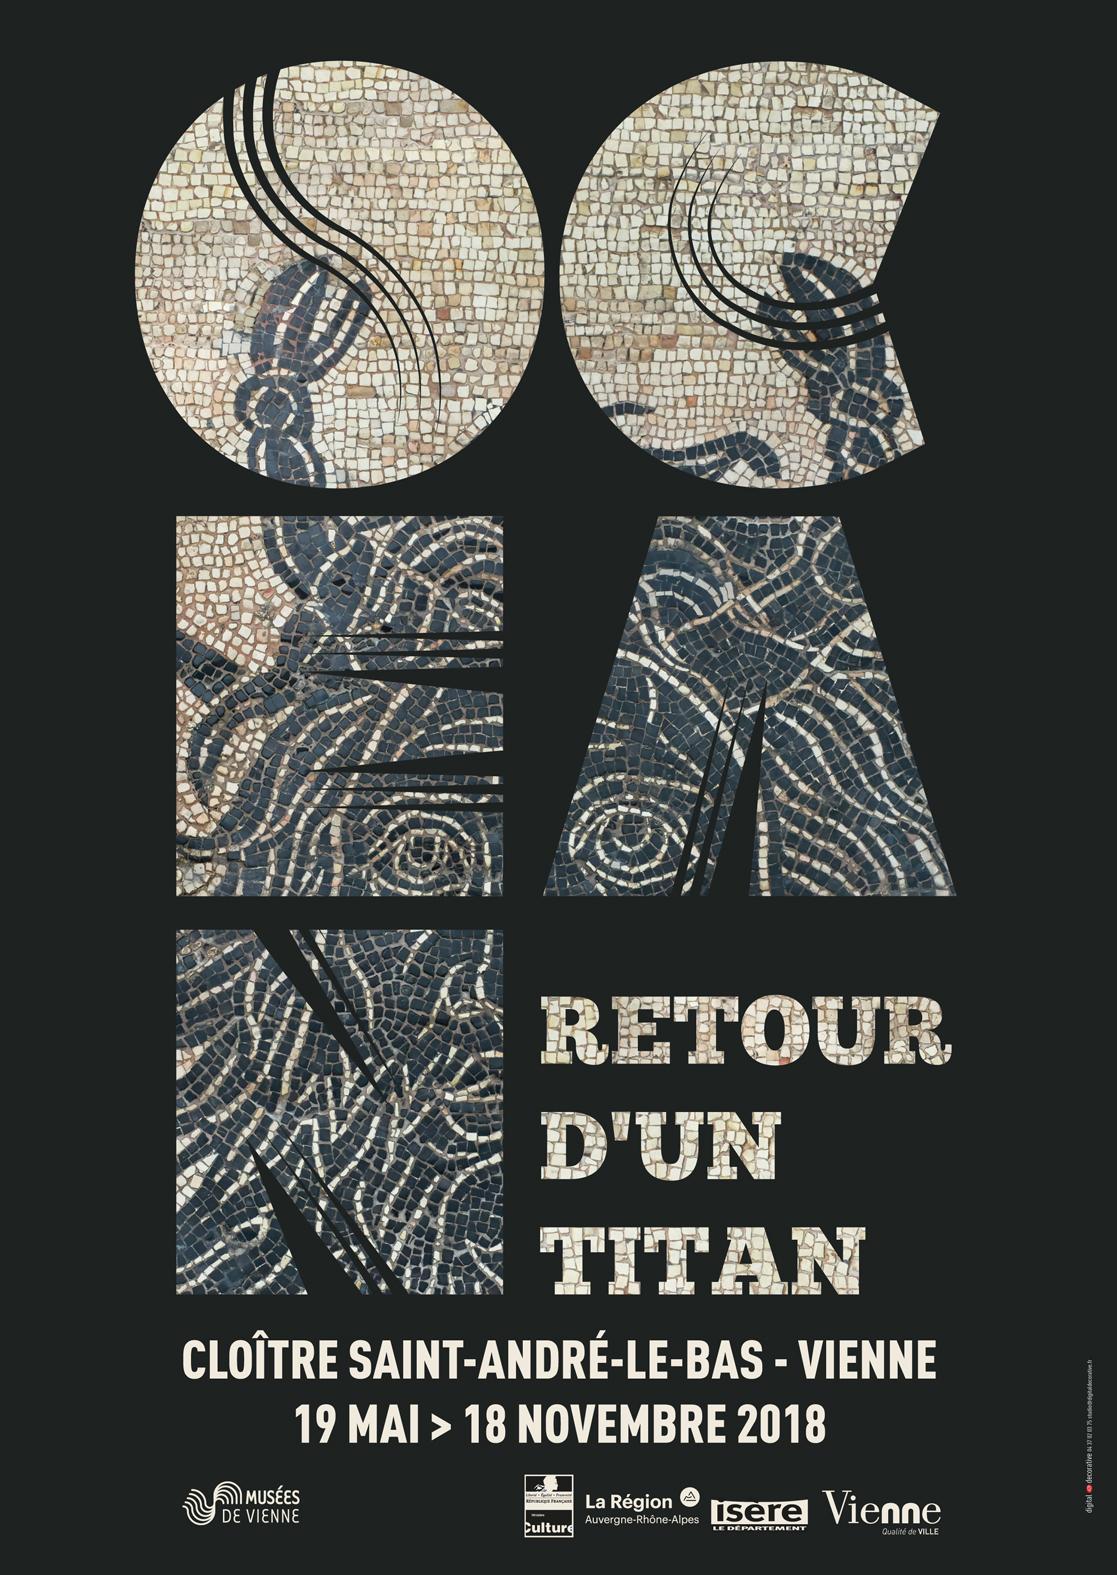 Océan retour d'un titan Sextant Creative